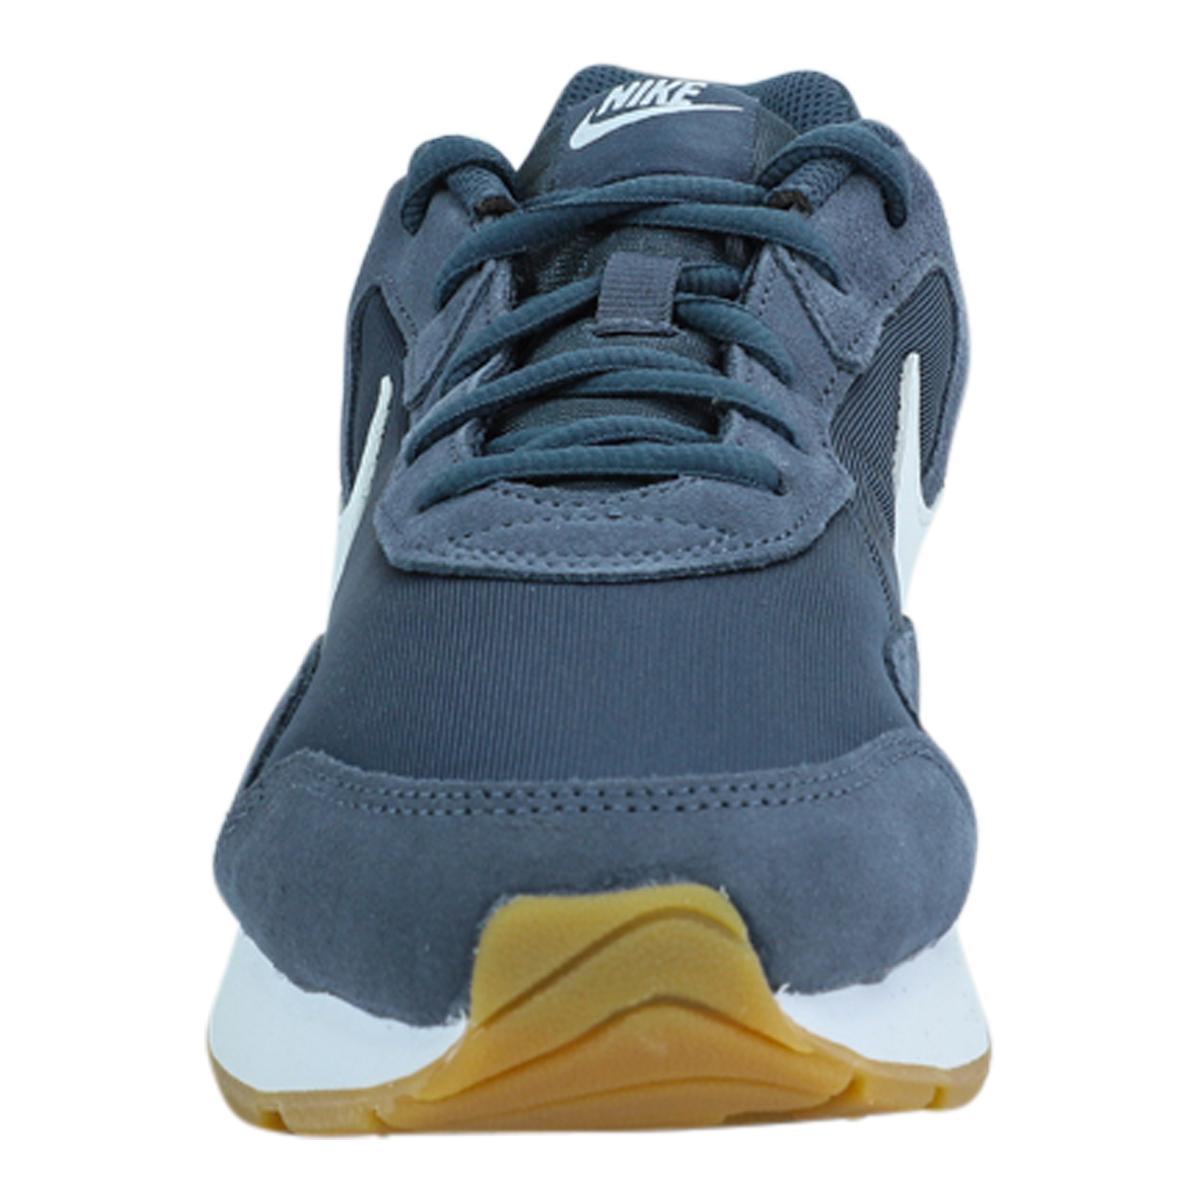 Nike-Men-039-s-Delfine-Running-Shoes thumbnail 15